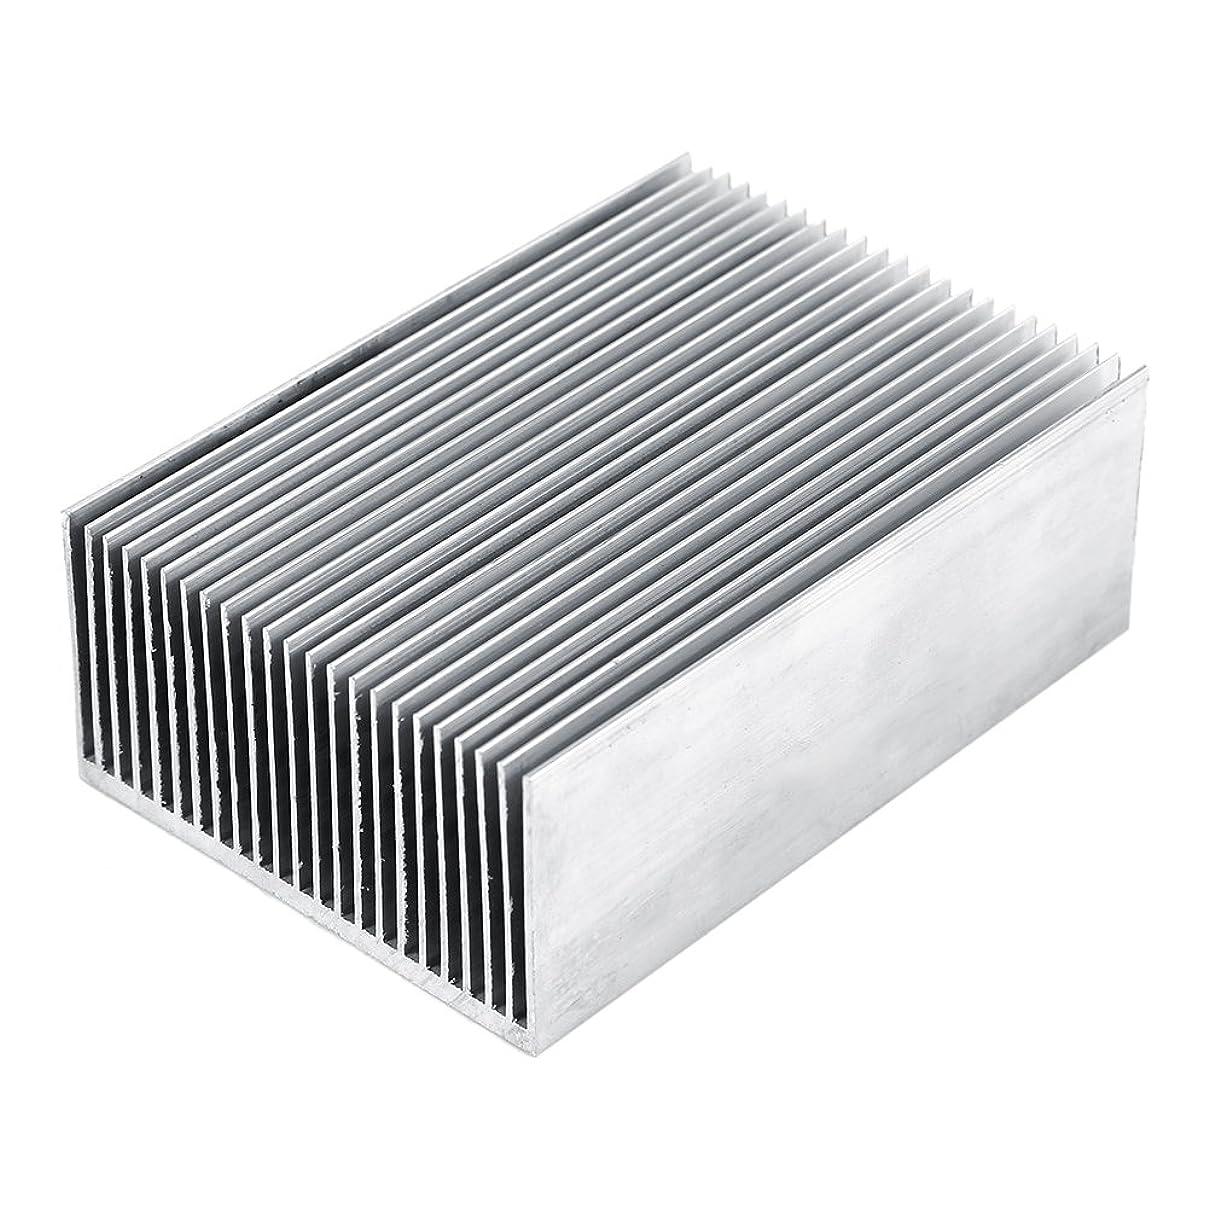 Aluminum Heat Sink Heatsink,Cooler Cooling for Led Amplifier Transistor IC Module 3.93